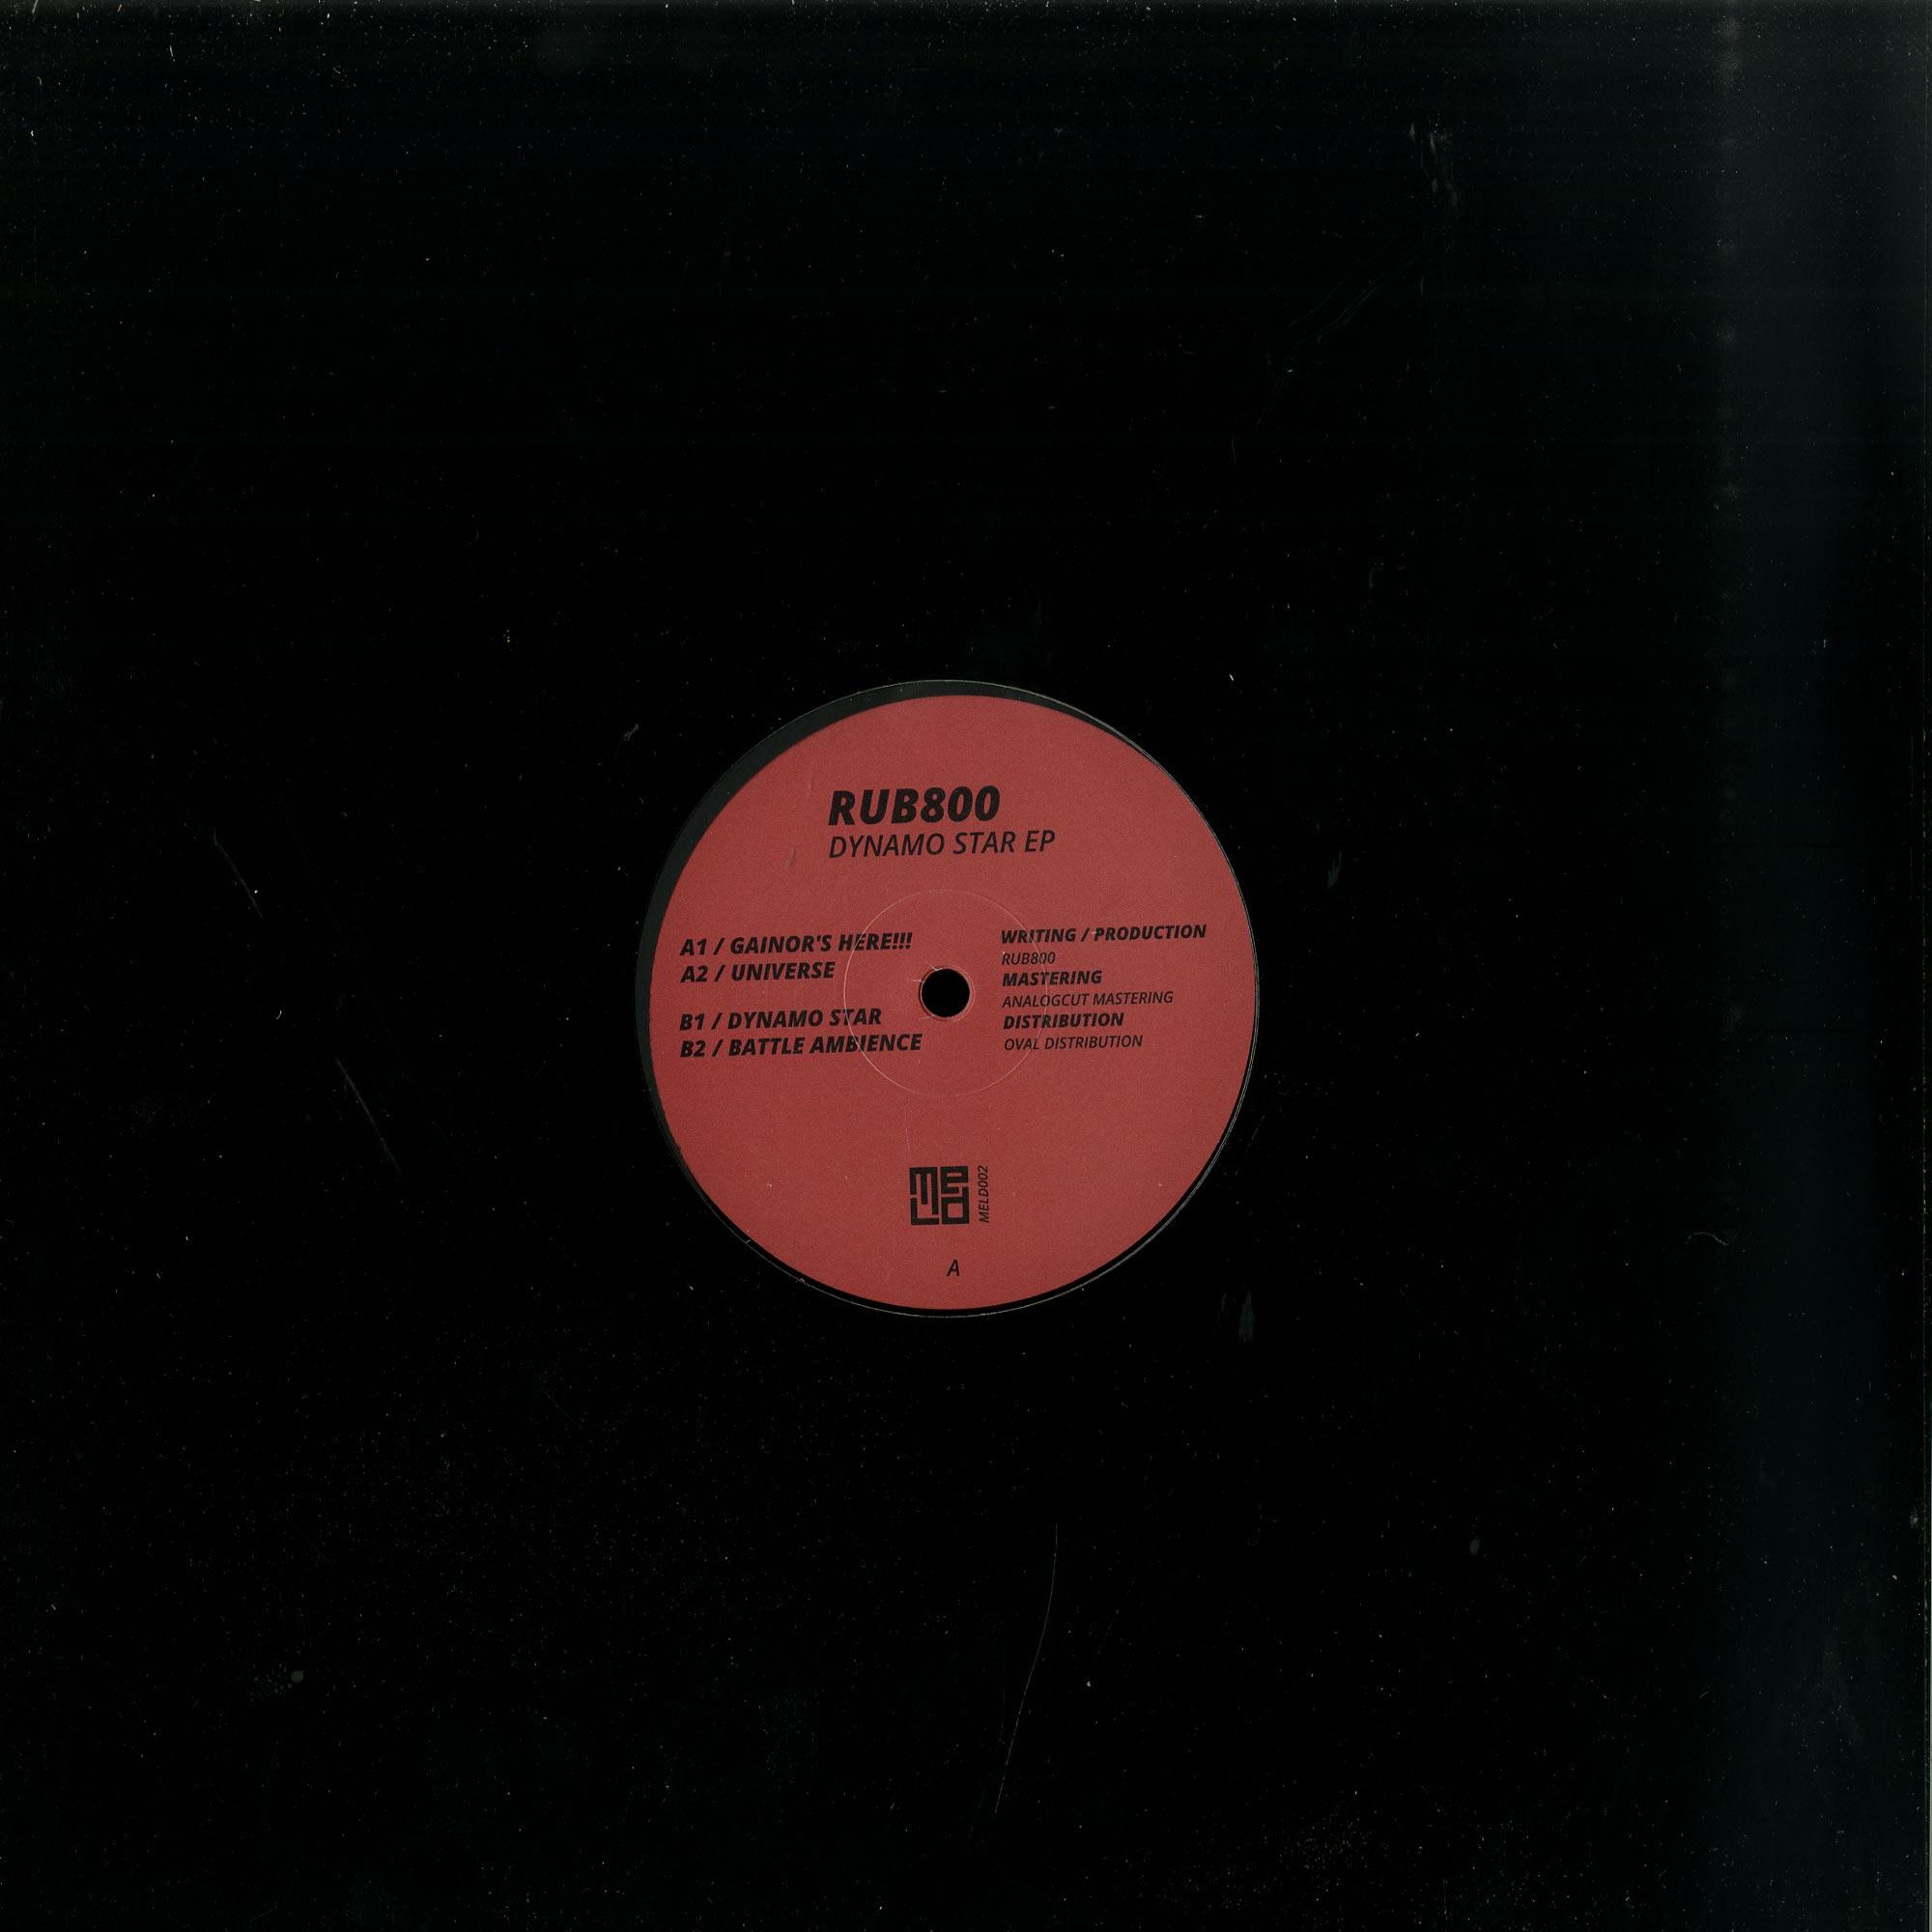 Rub800 - DYNAMO STAR EP